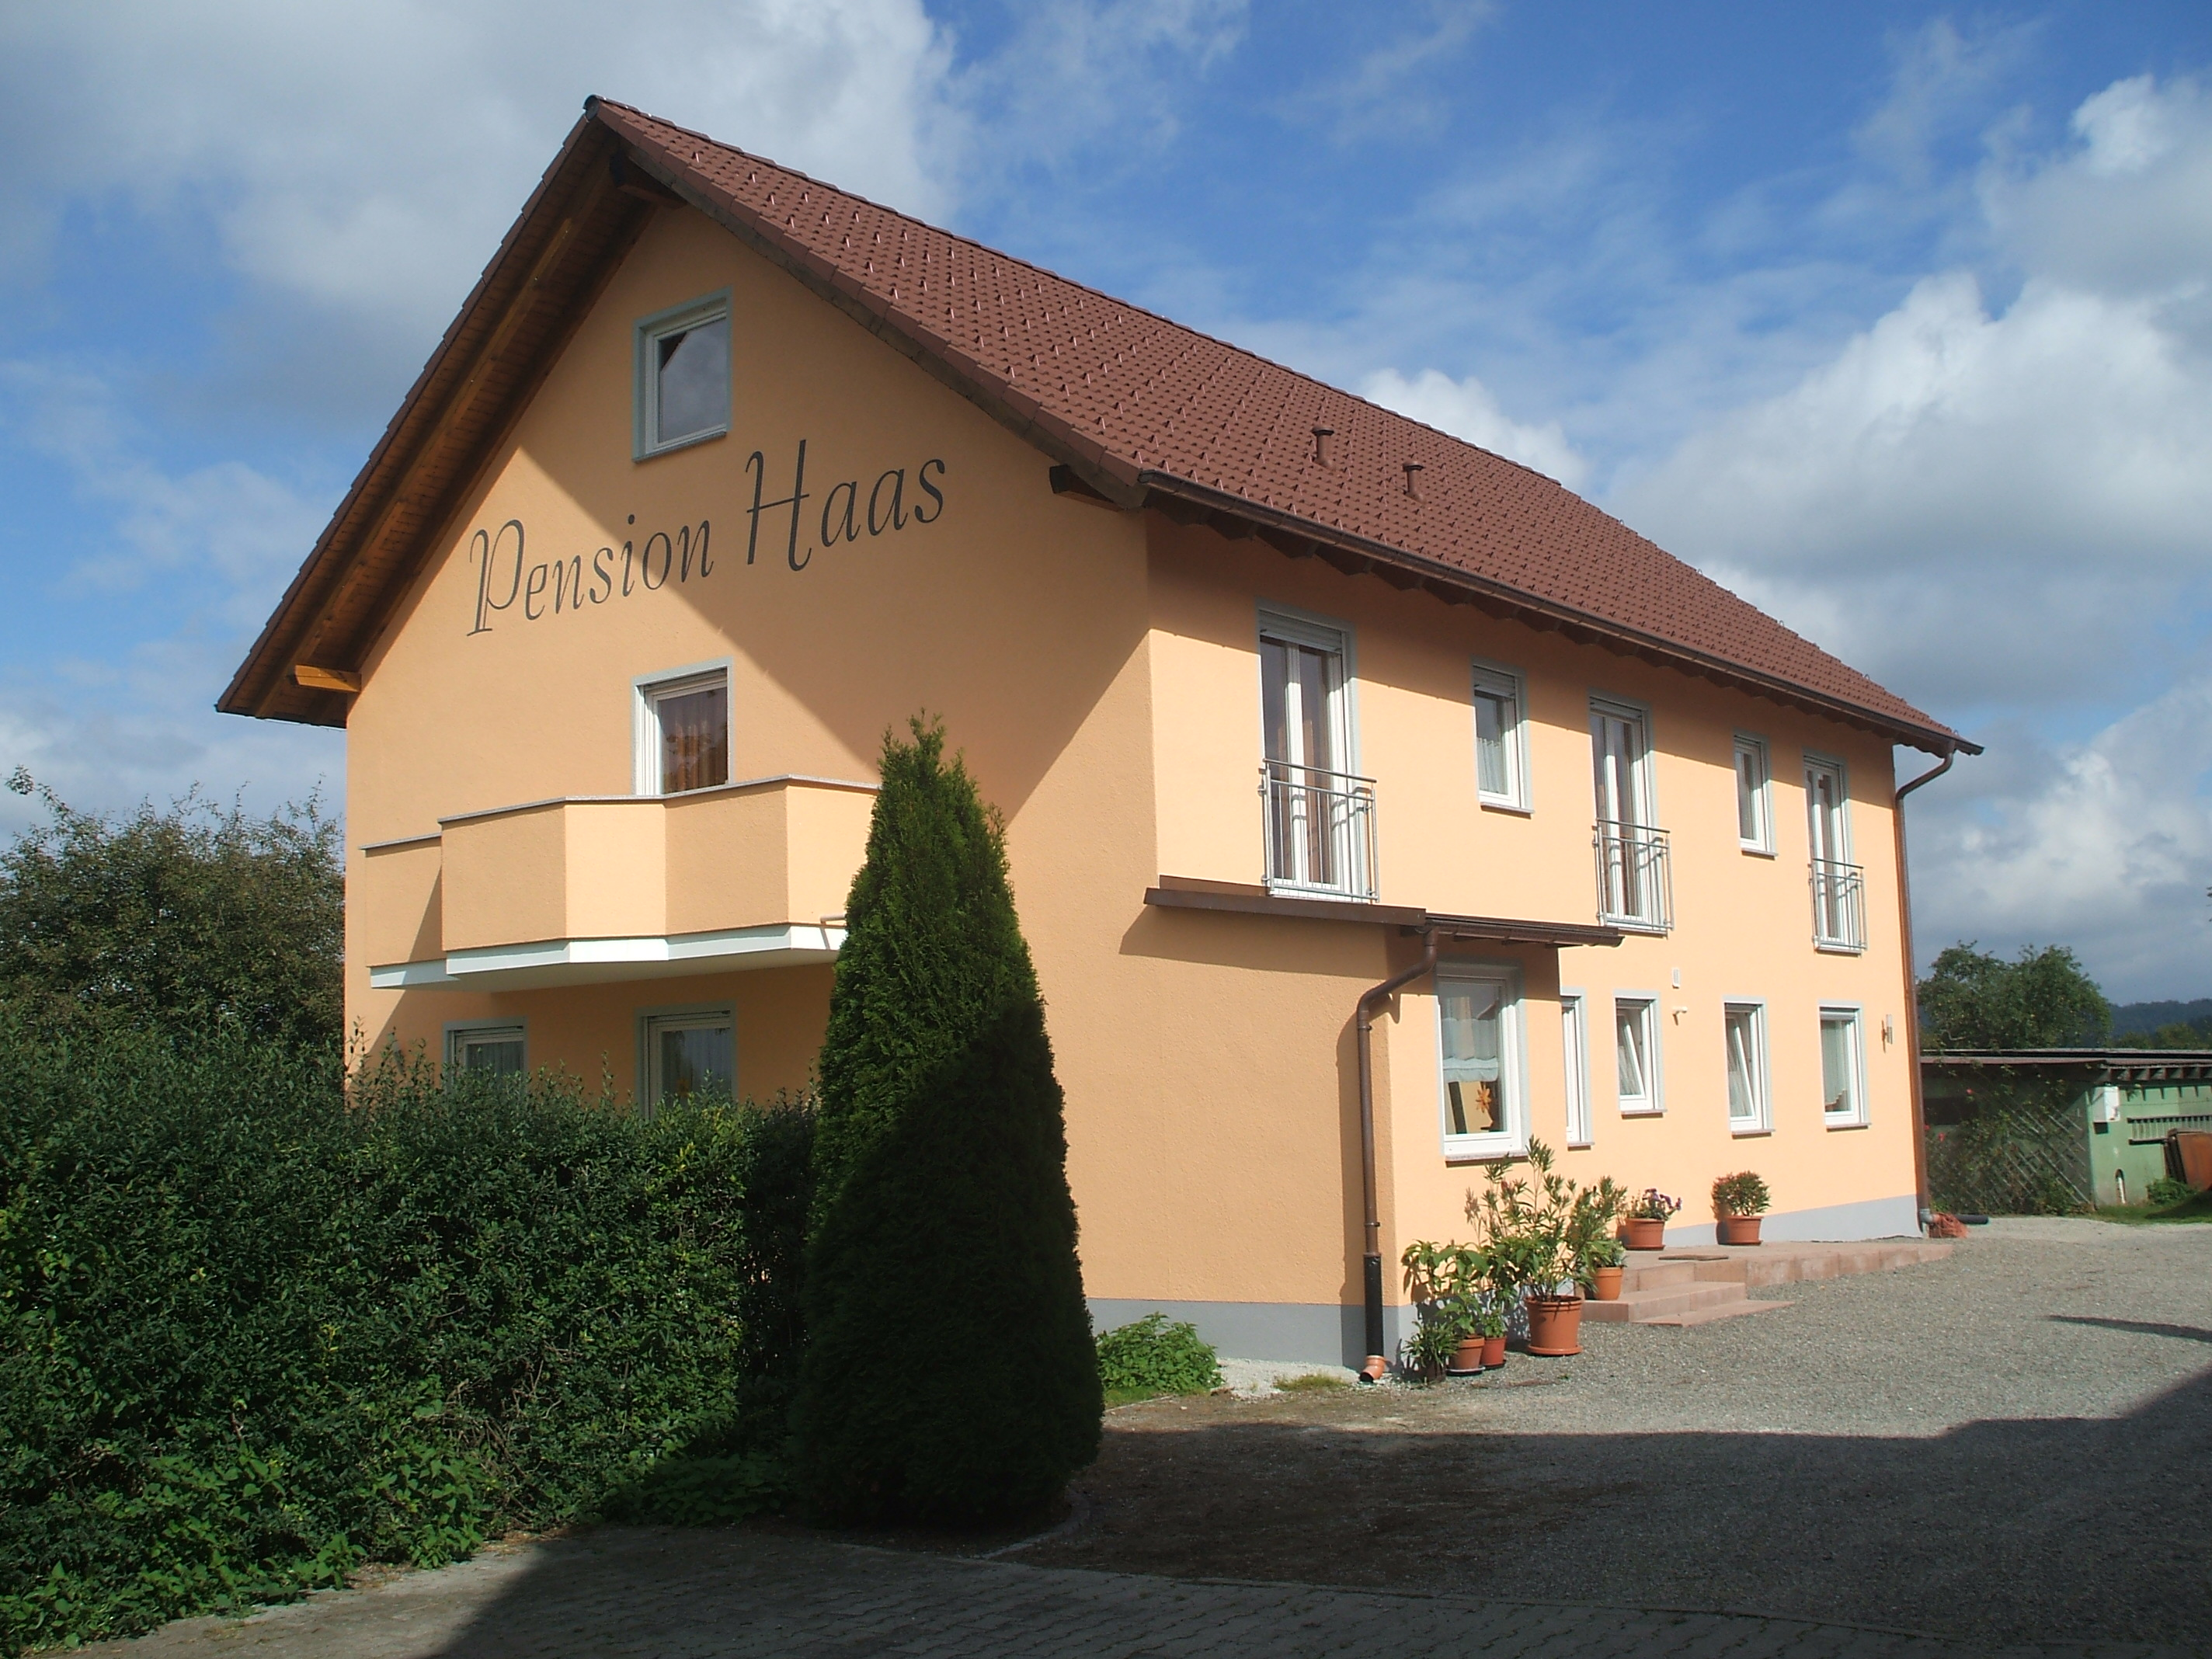 Pension Haas Hotel am Turm